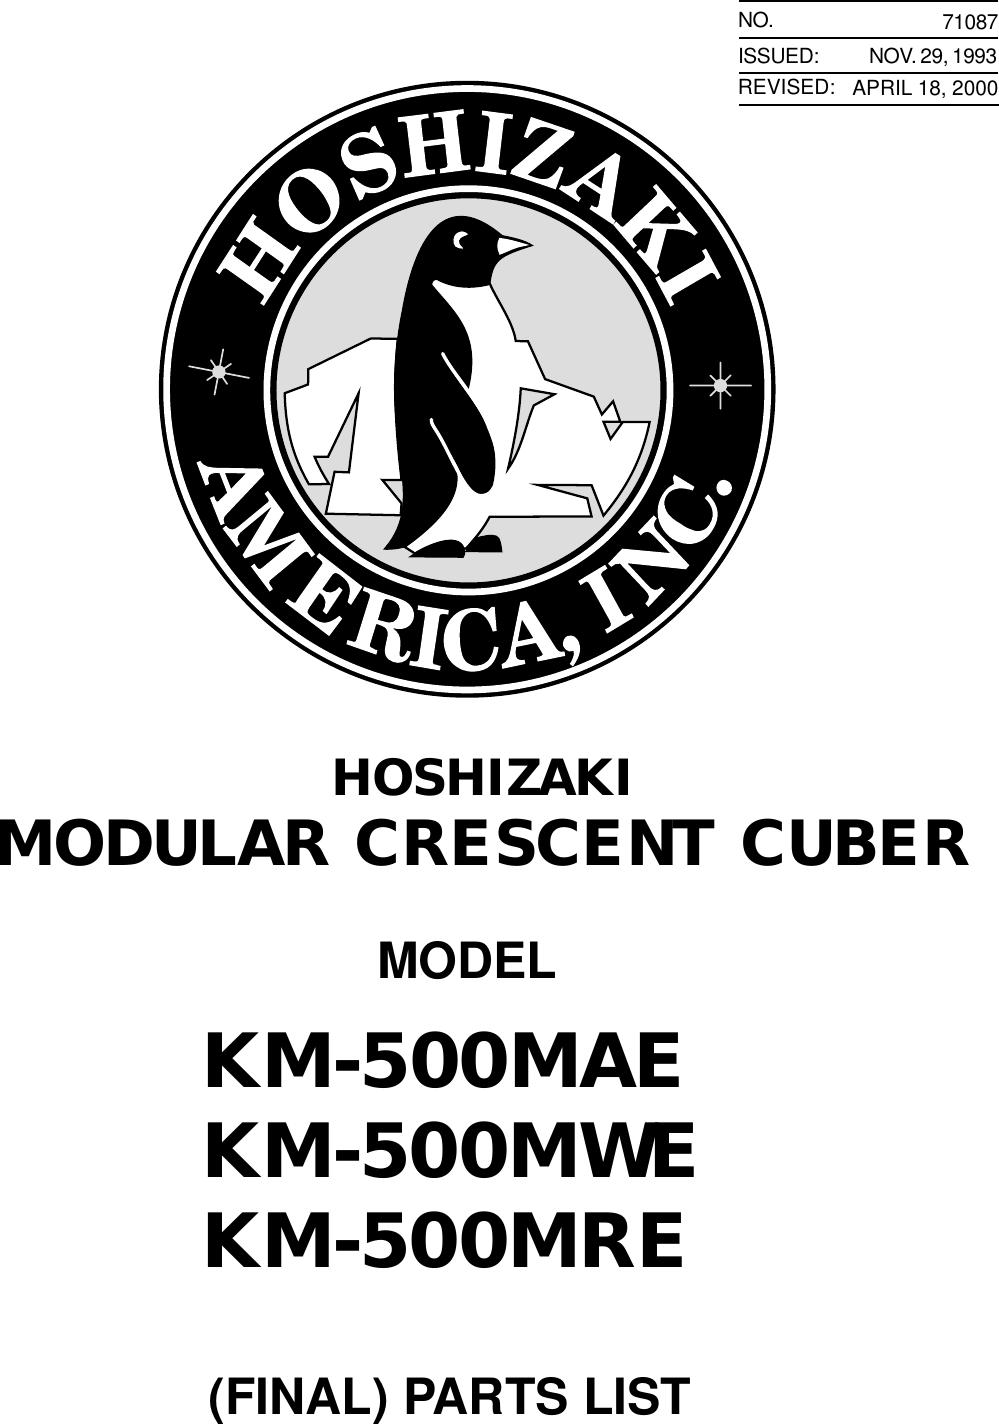 Hoshizaki Modular Crescent Cuber Km 500Mae Users Manual